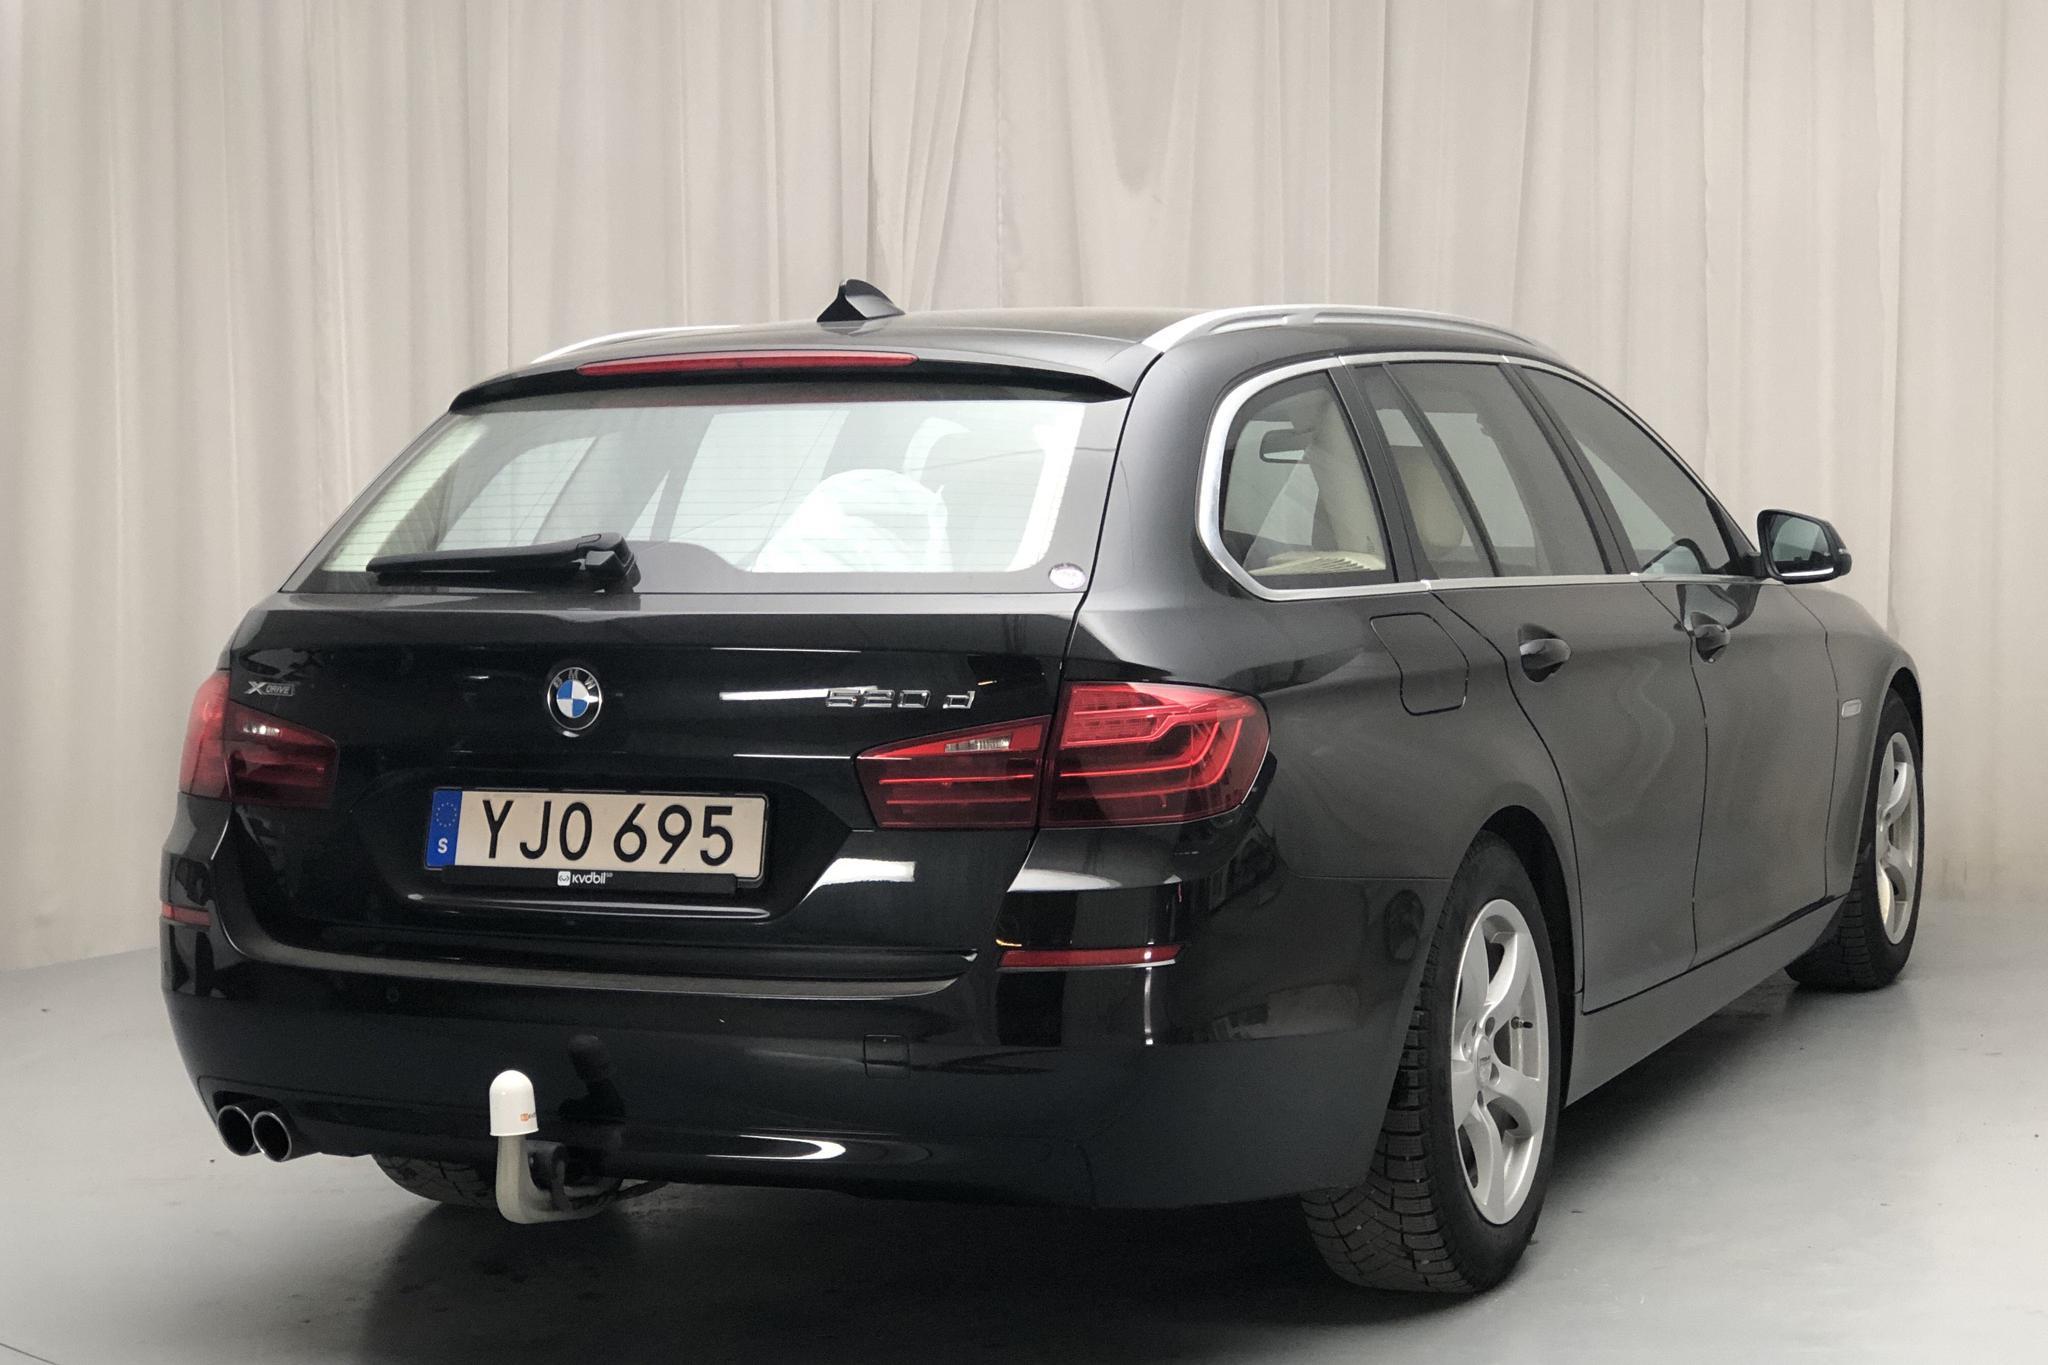 BMW 520d xDrive Touring, F11 (190hk) - 10 512 mil - Automat - svart - 2017